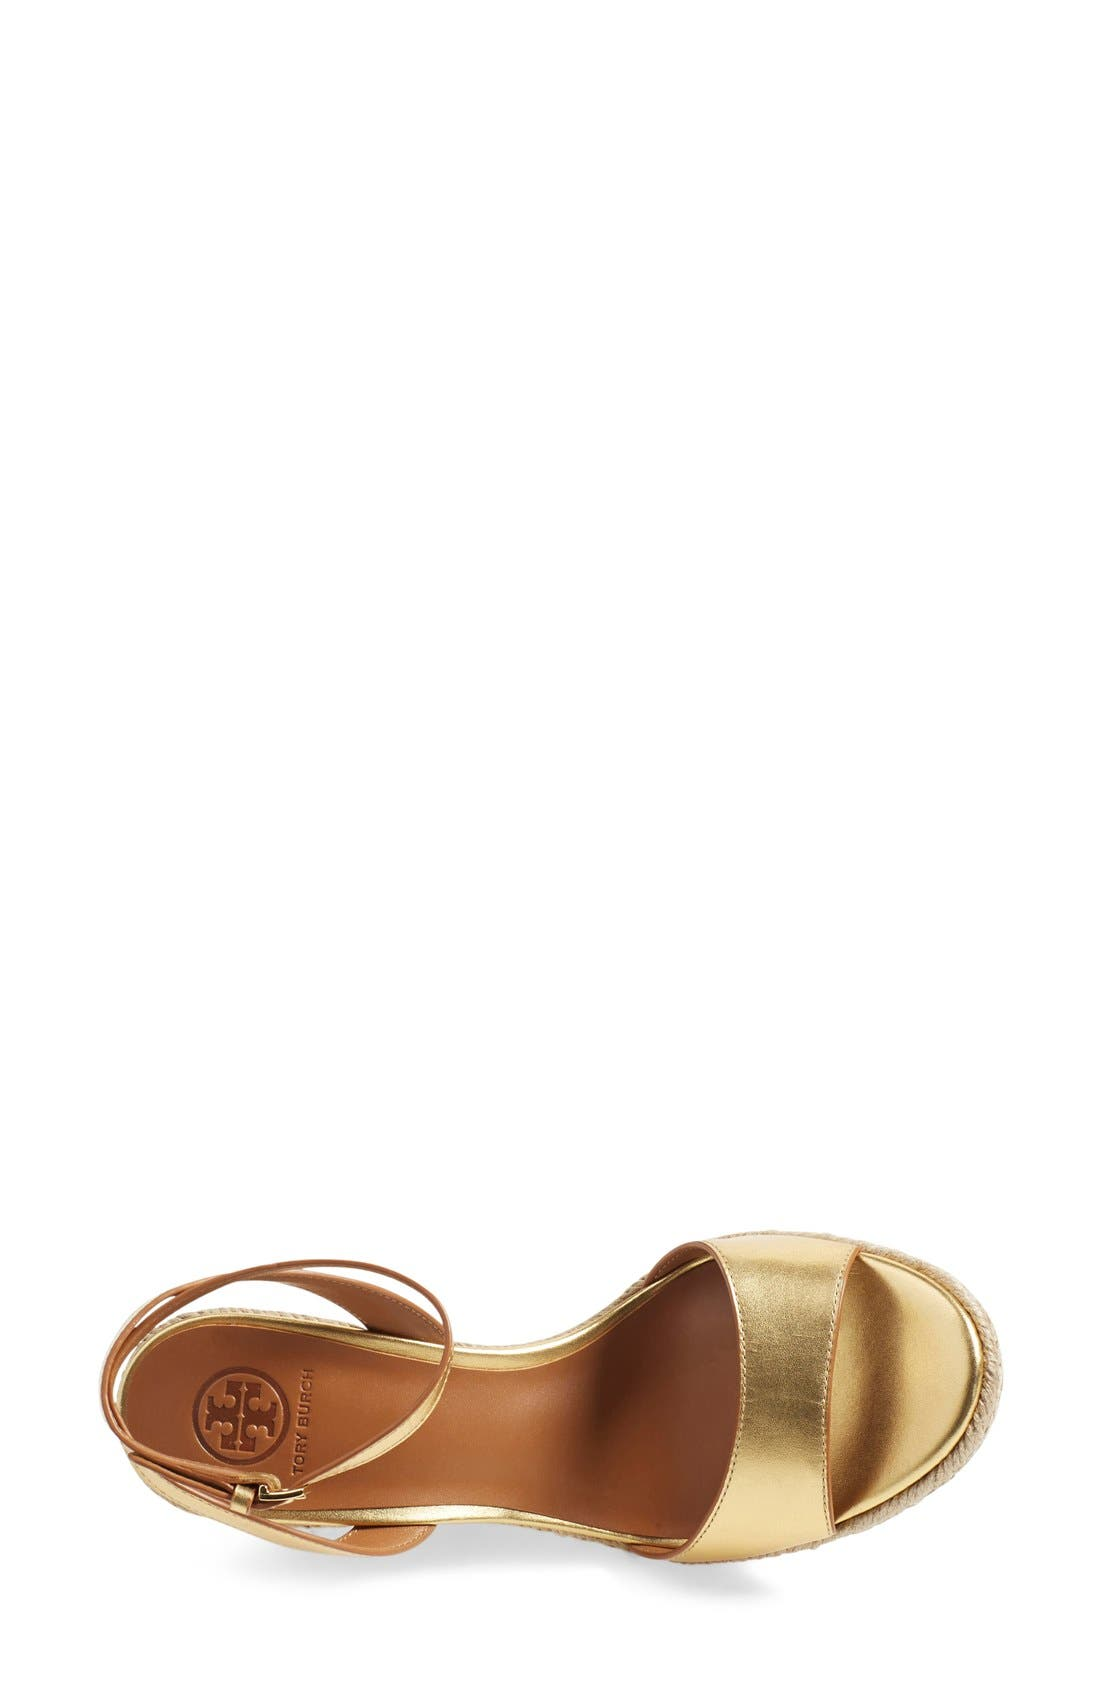 Wedge Sandal,                             Alternate thumbnail 2, color,                             710